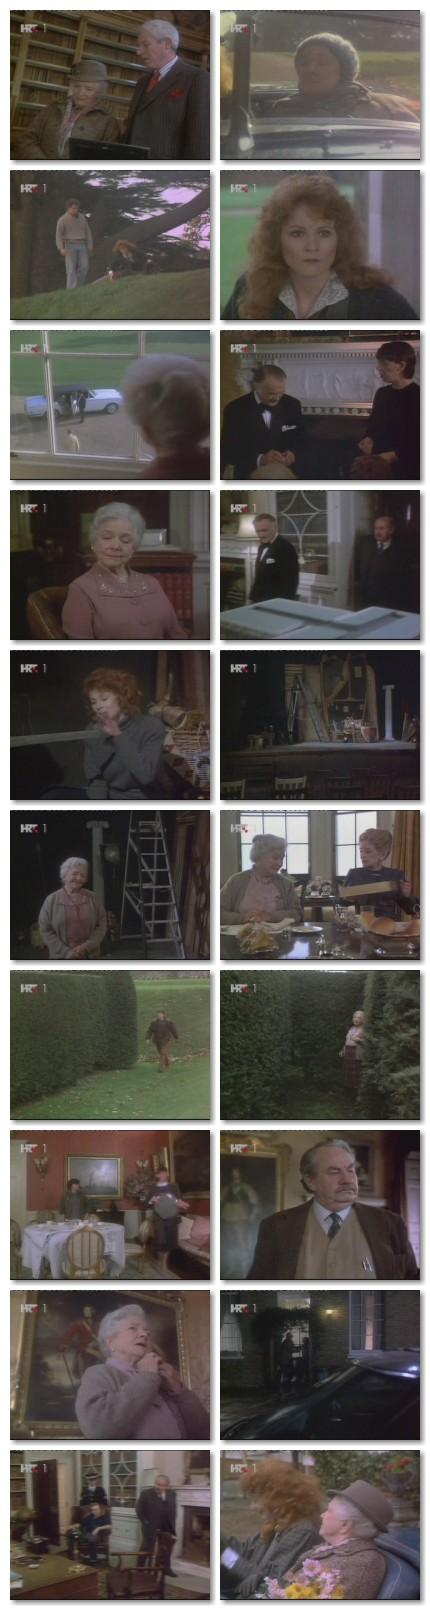 1985murderwithmirrors